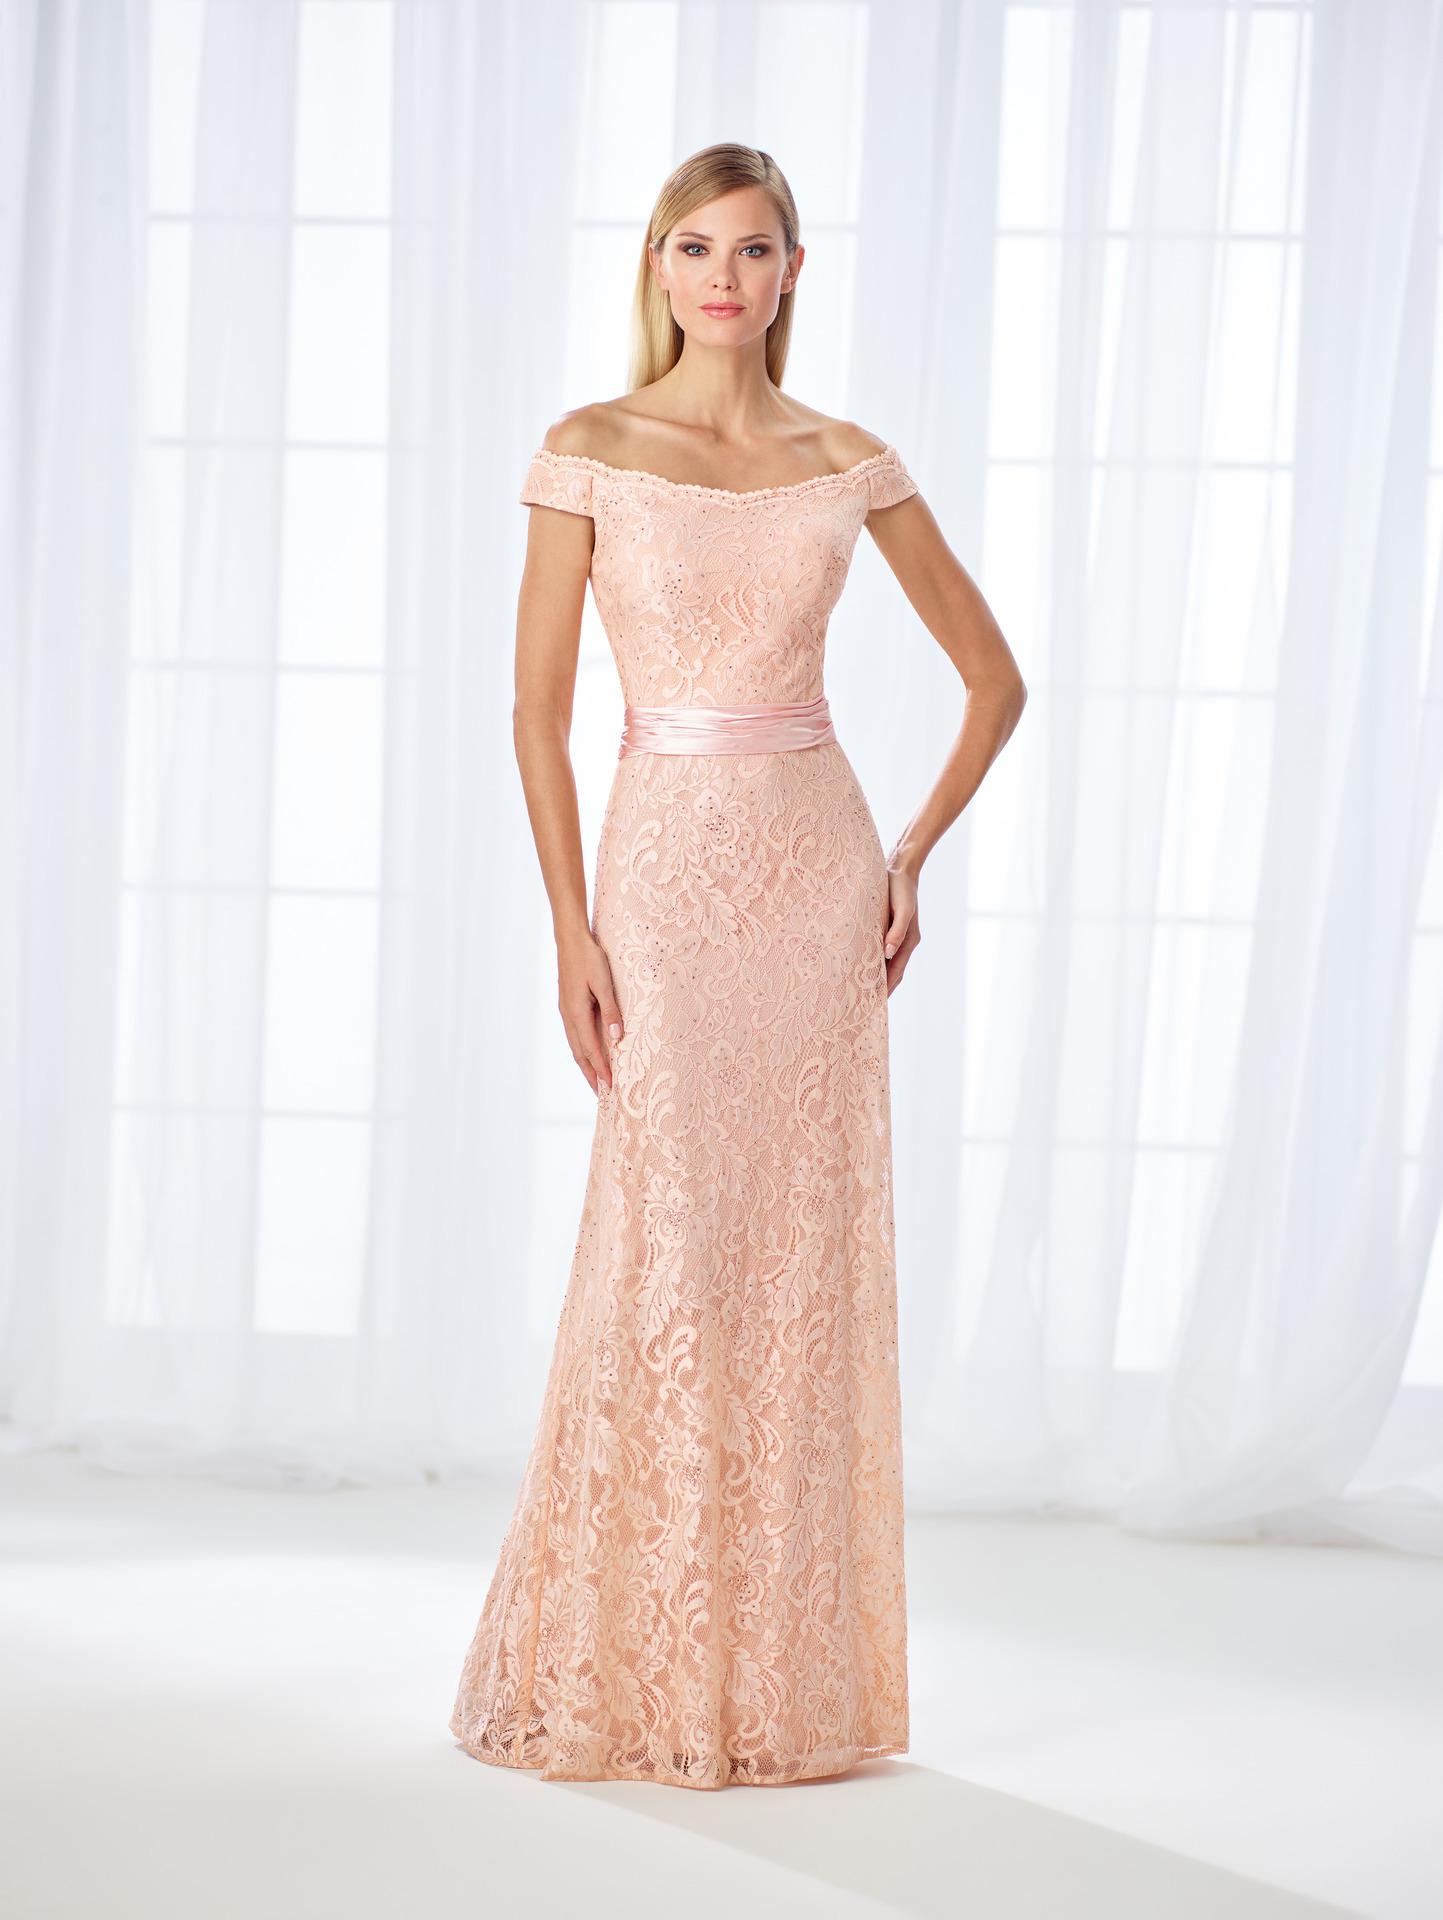 9175c9021916 Έξωμο φόρεμα από σατέν & δαντέλα Cameron Blake 118670- Venetti